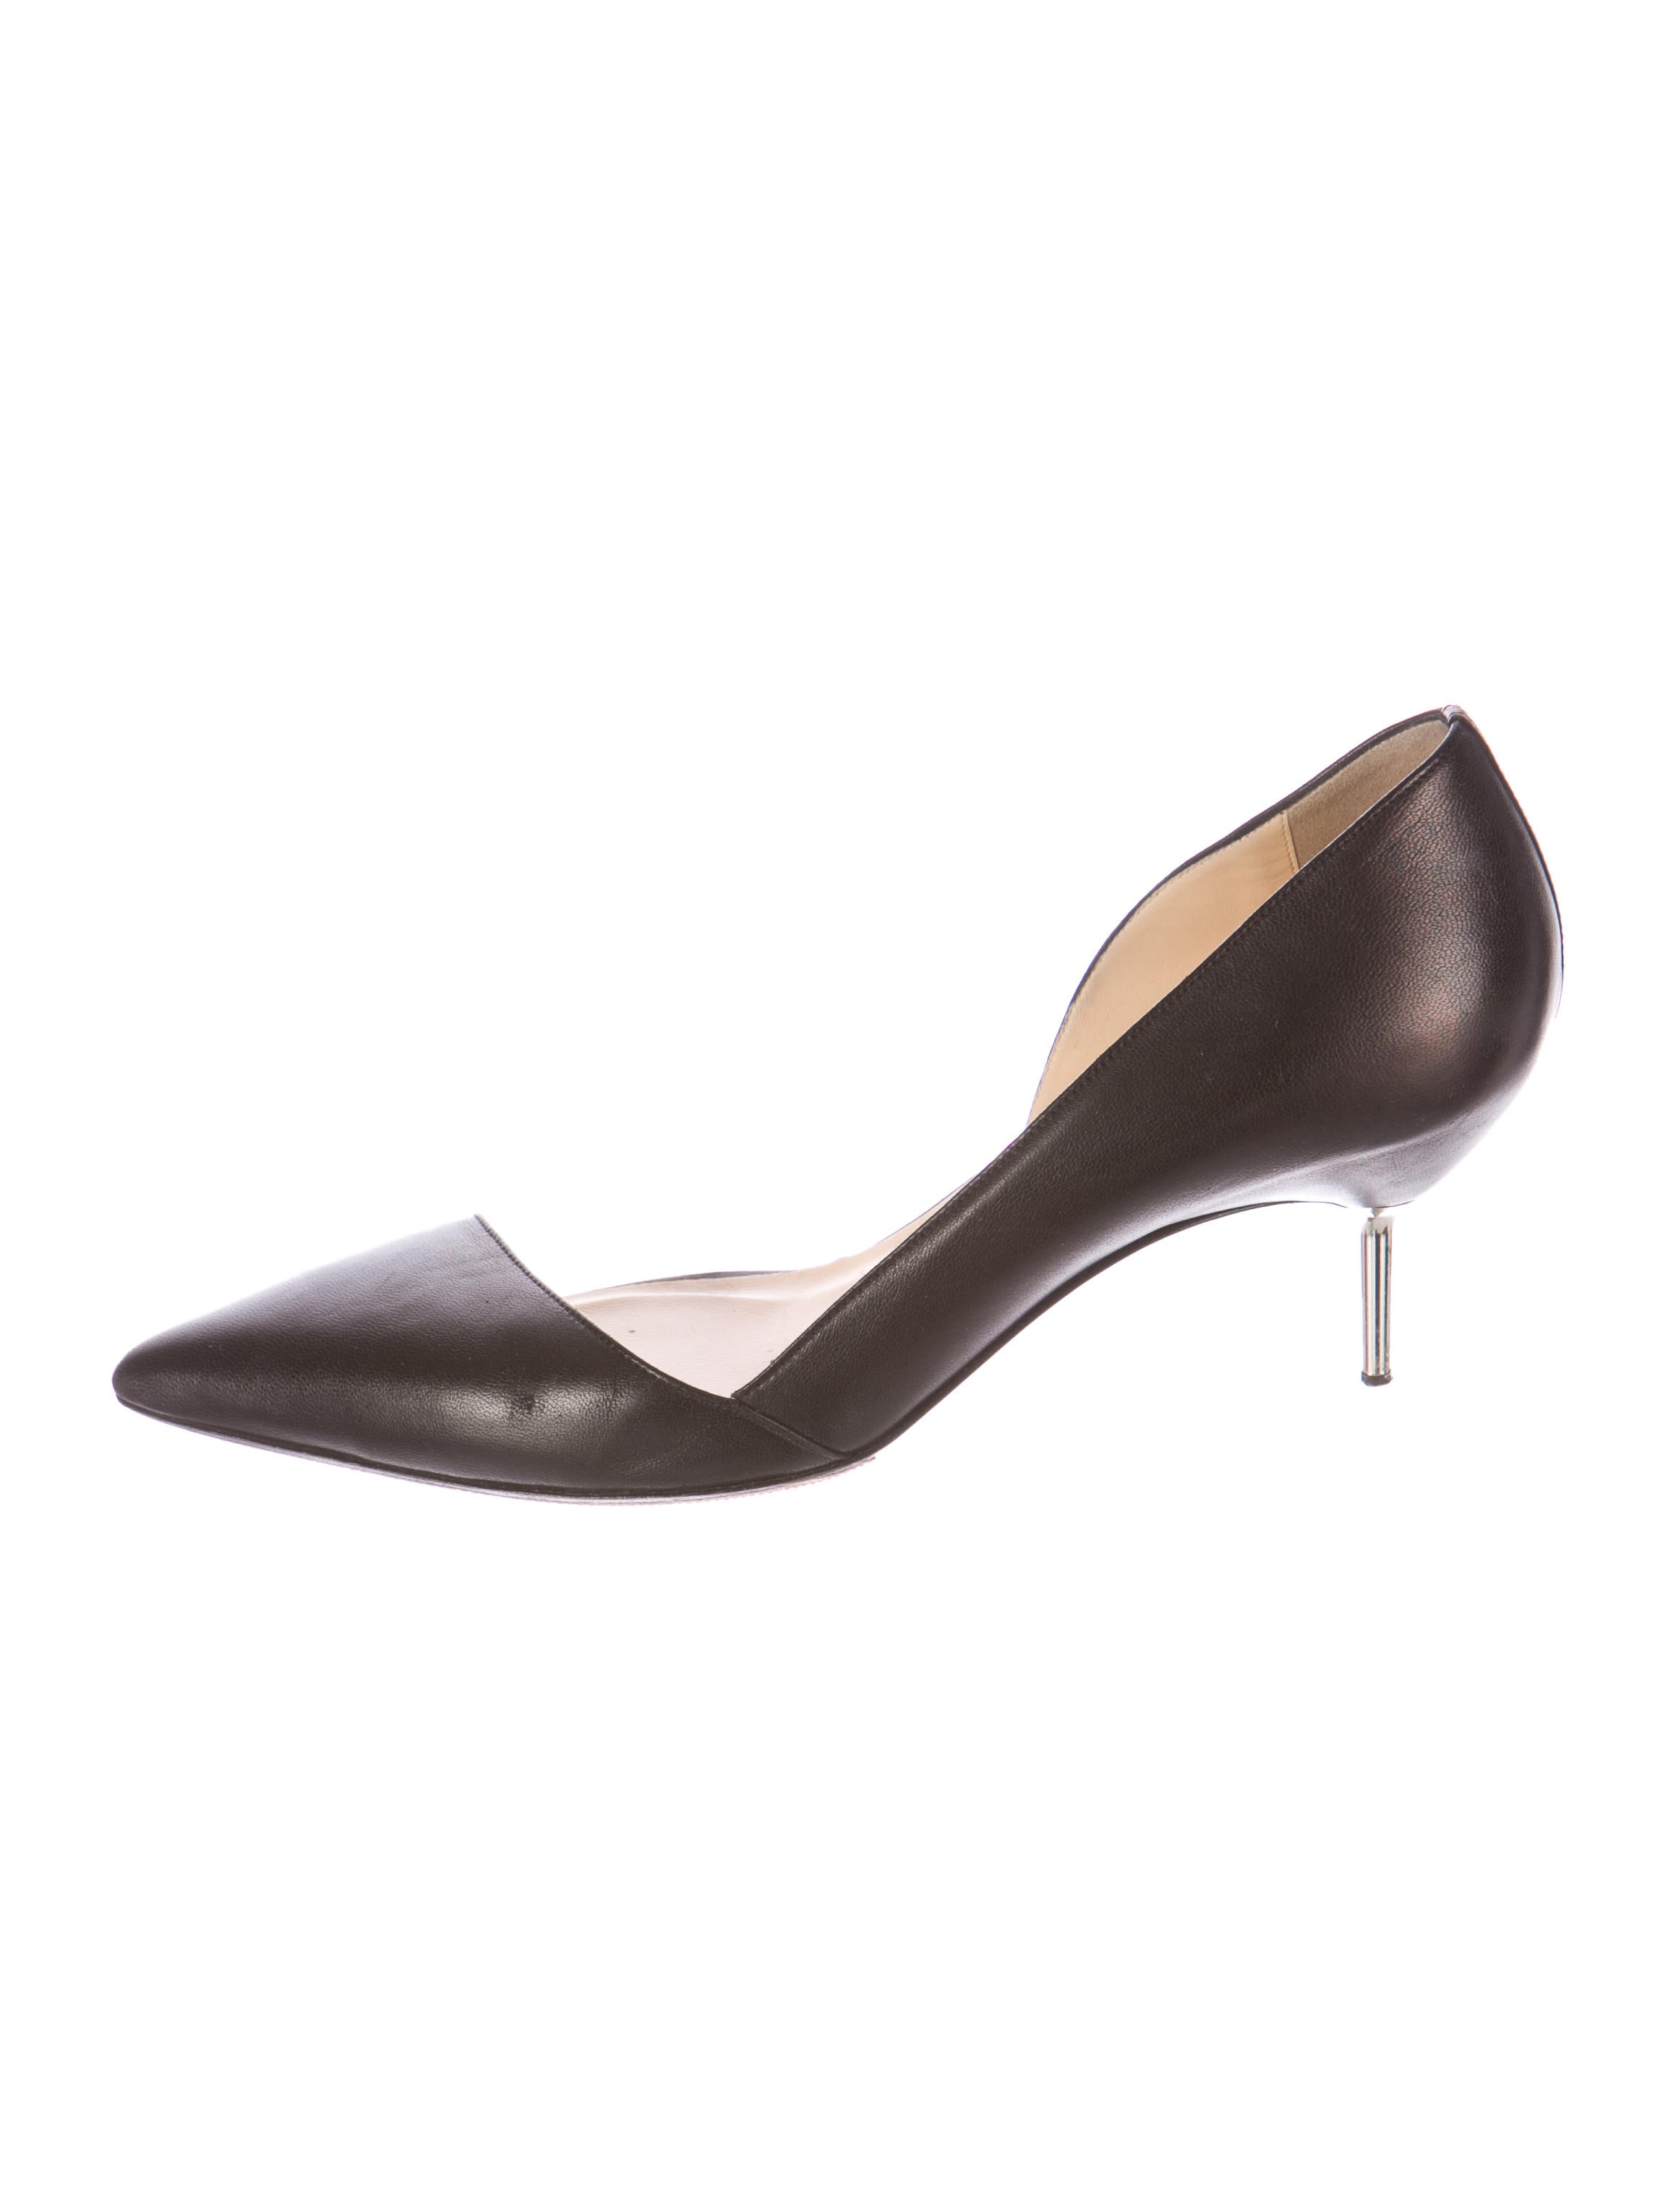 sneakers for cheap ca562 19108 christian louboutin kitten heels